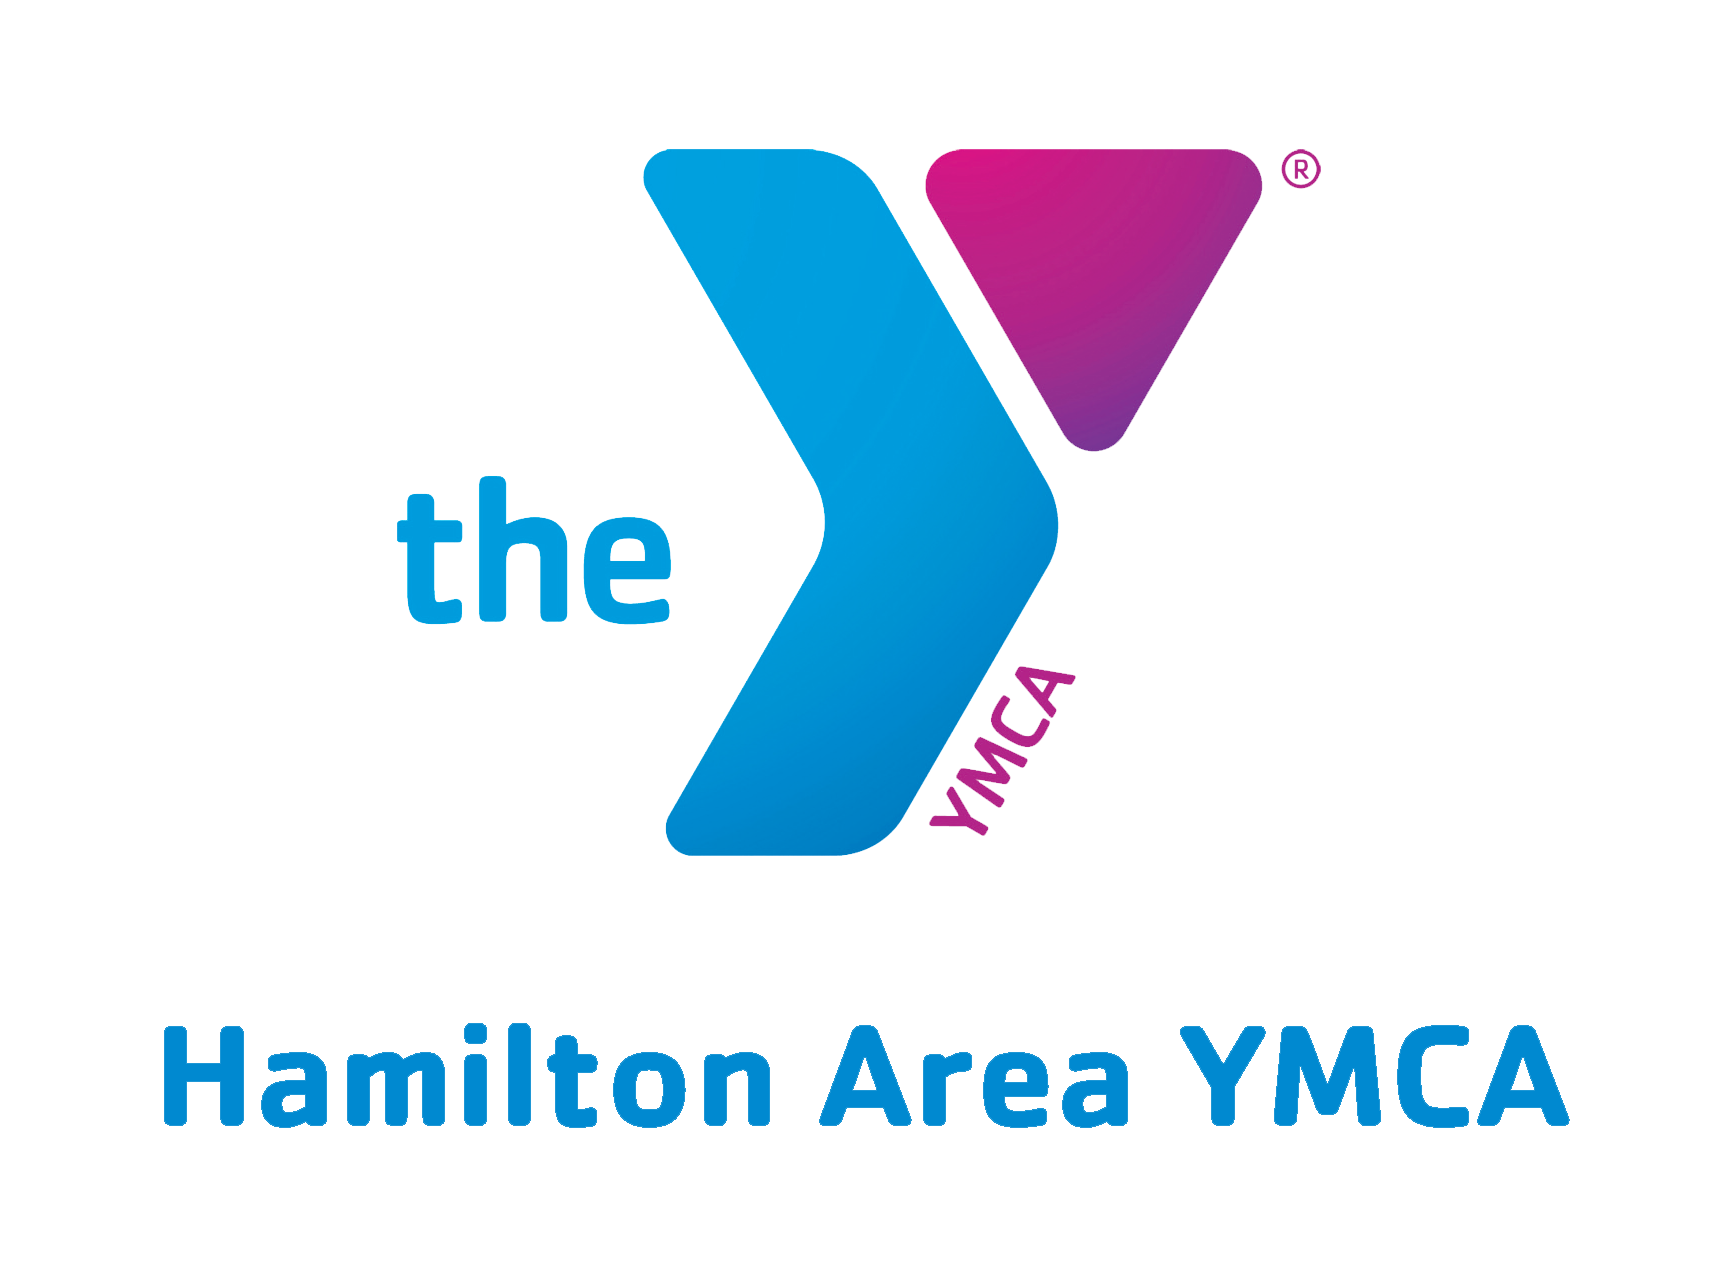 Hamilton Area NJ YMCA